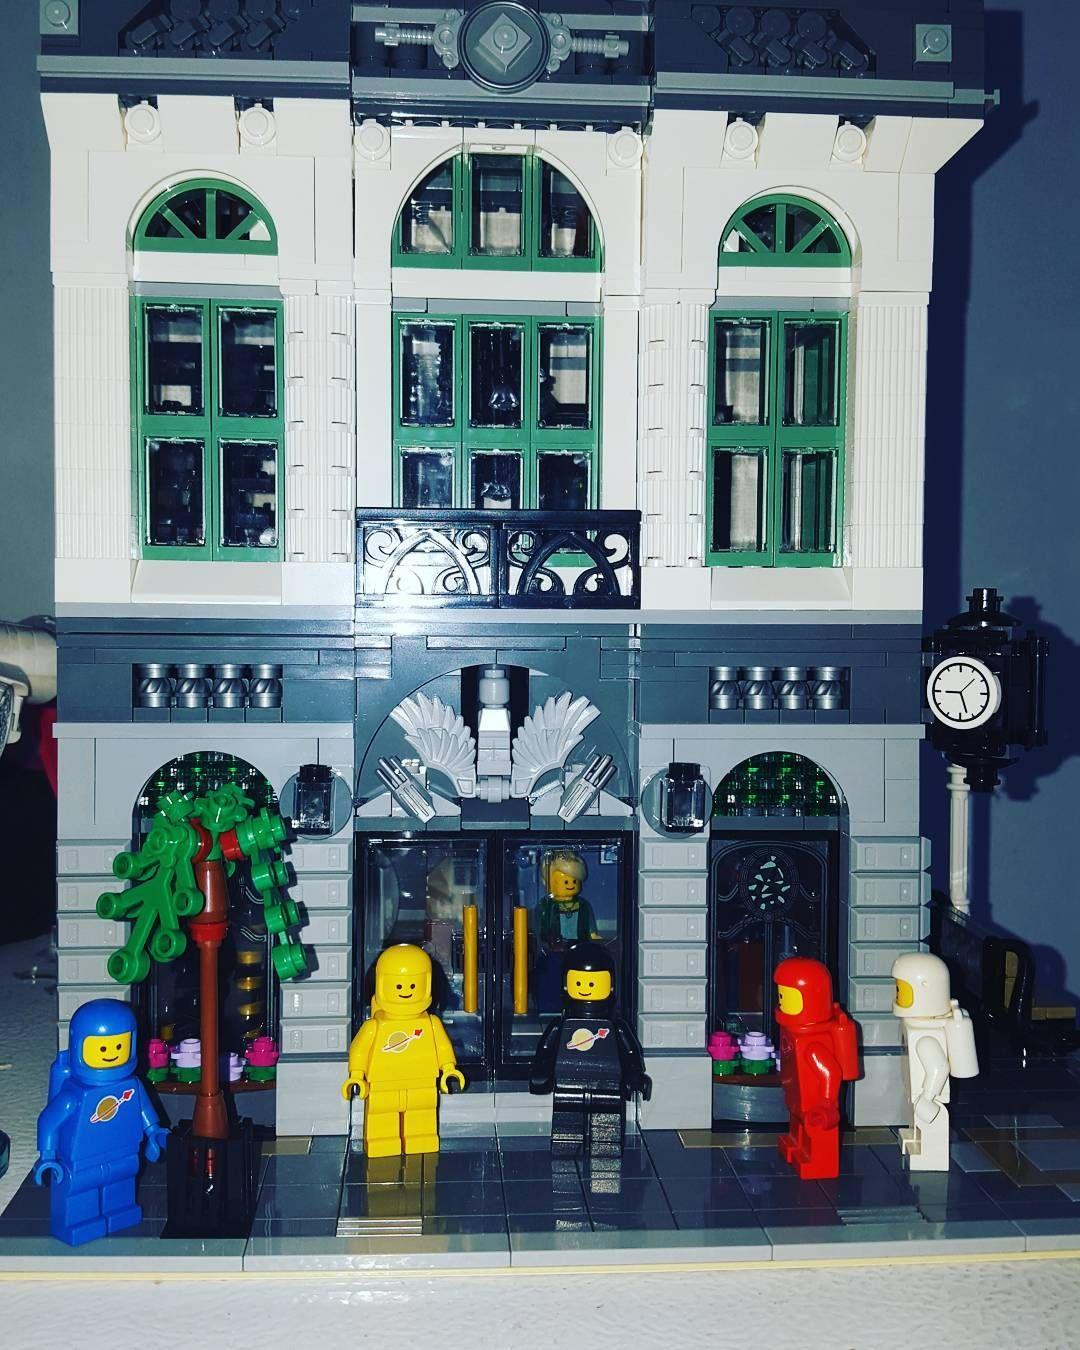 Busy day at the brick bank #legominifigs #brickfan #bricklinkseller #bricklink #legostagram #brick_vision #legocollection #modular #afol #legos #minifigures #lego #classicspace #legophotography by londux